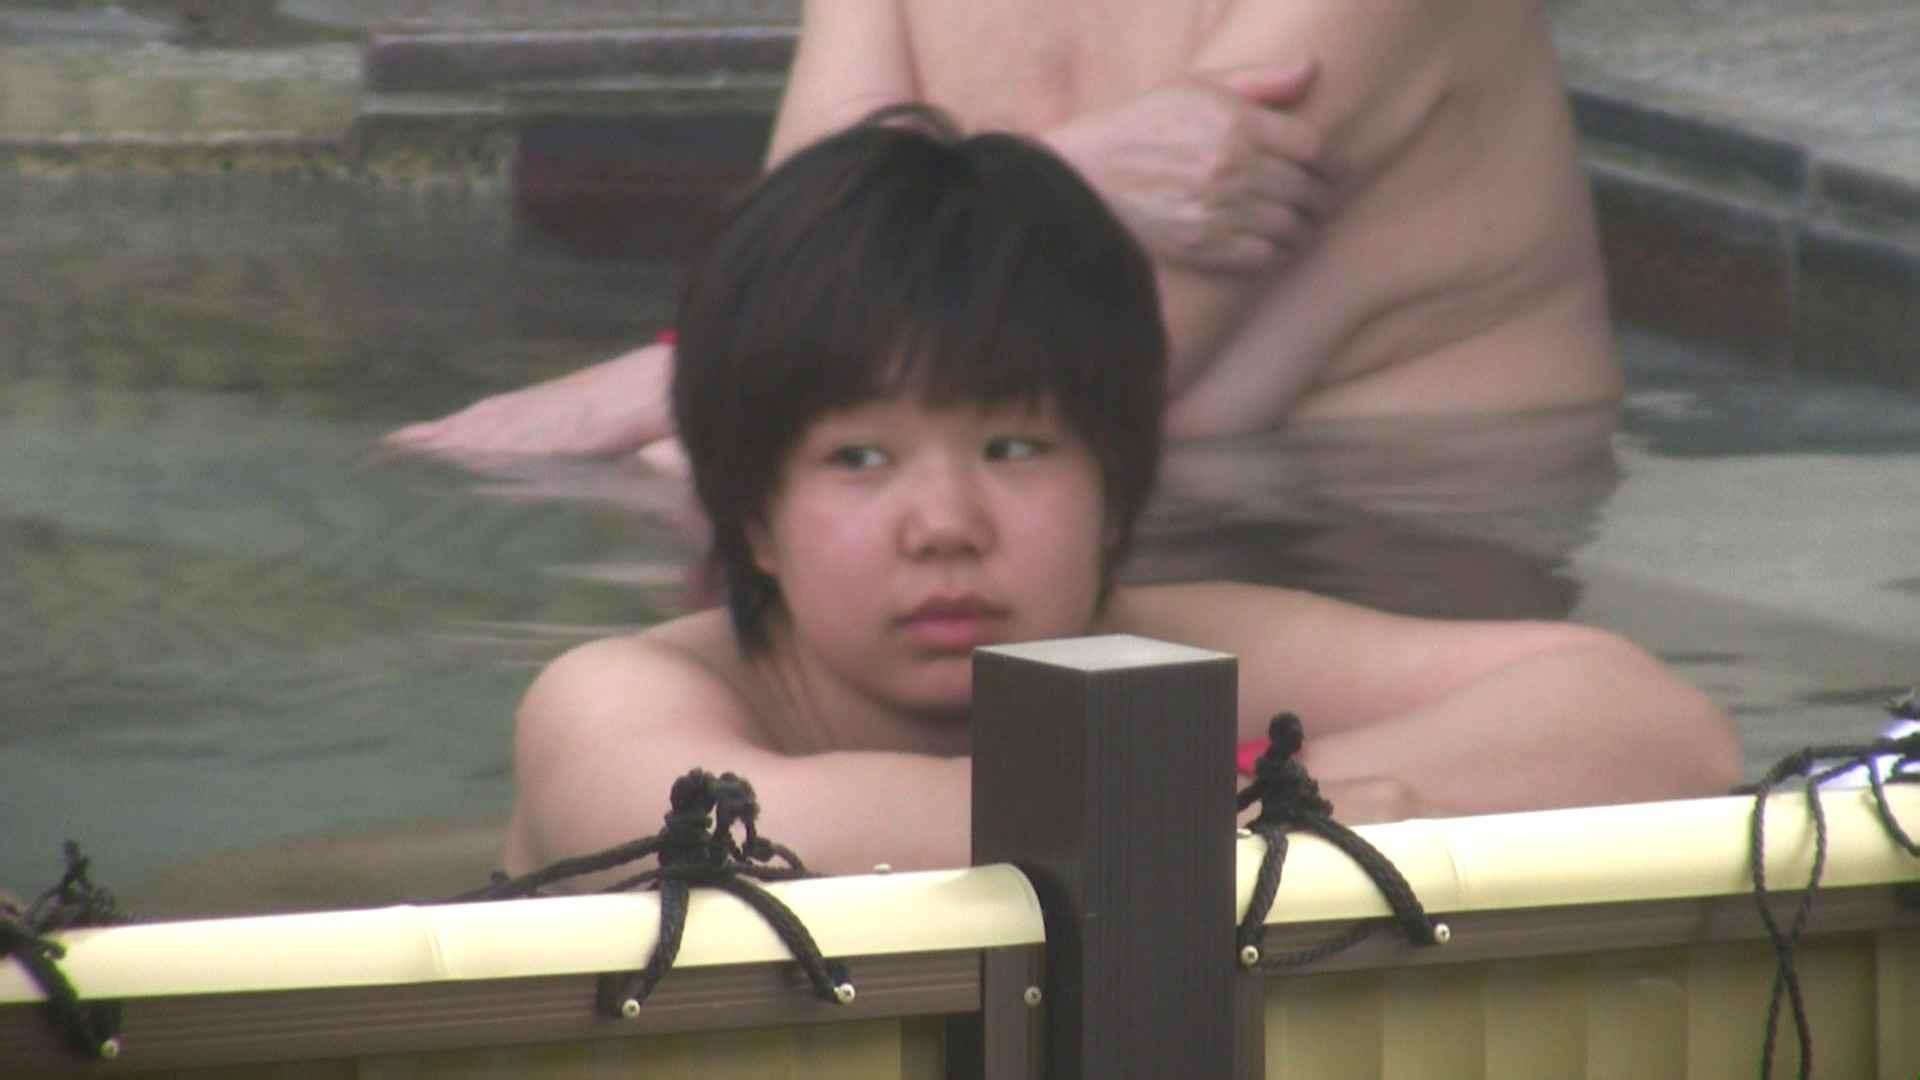 Aquaな露天風呂Vol.53【VIP限定】 女体盗撮 | OL女体  93連発 70